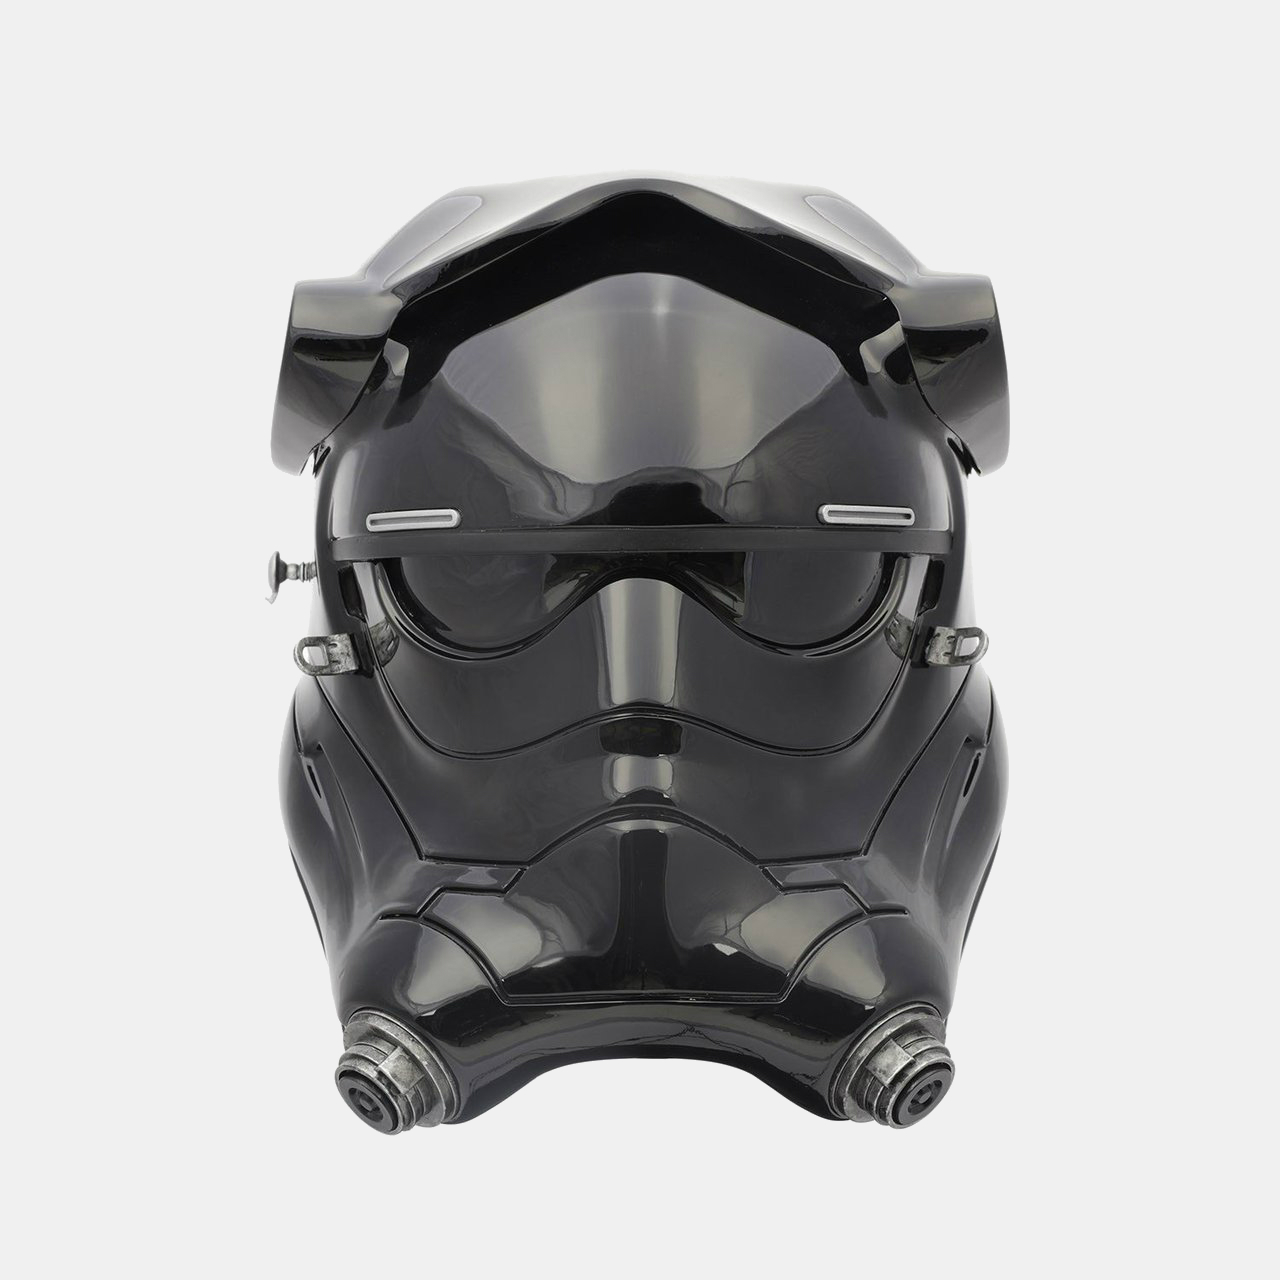 Star Wars The Force Awakens First Order TIE Fighter Pilot Helmet Replica